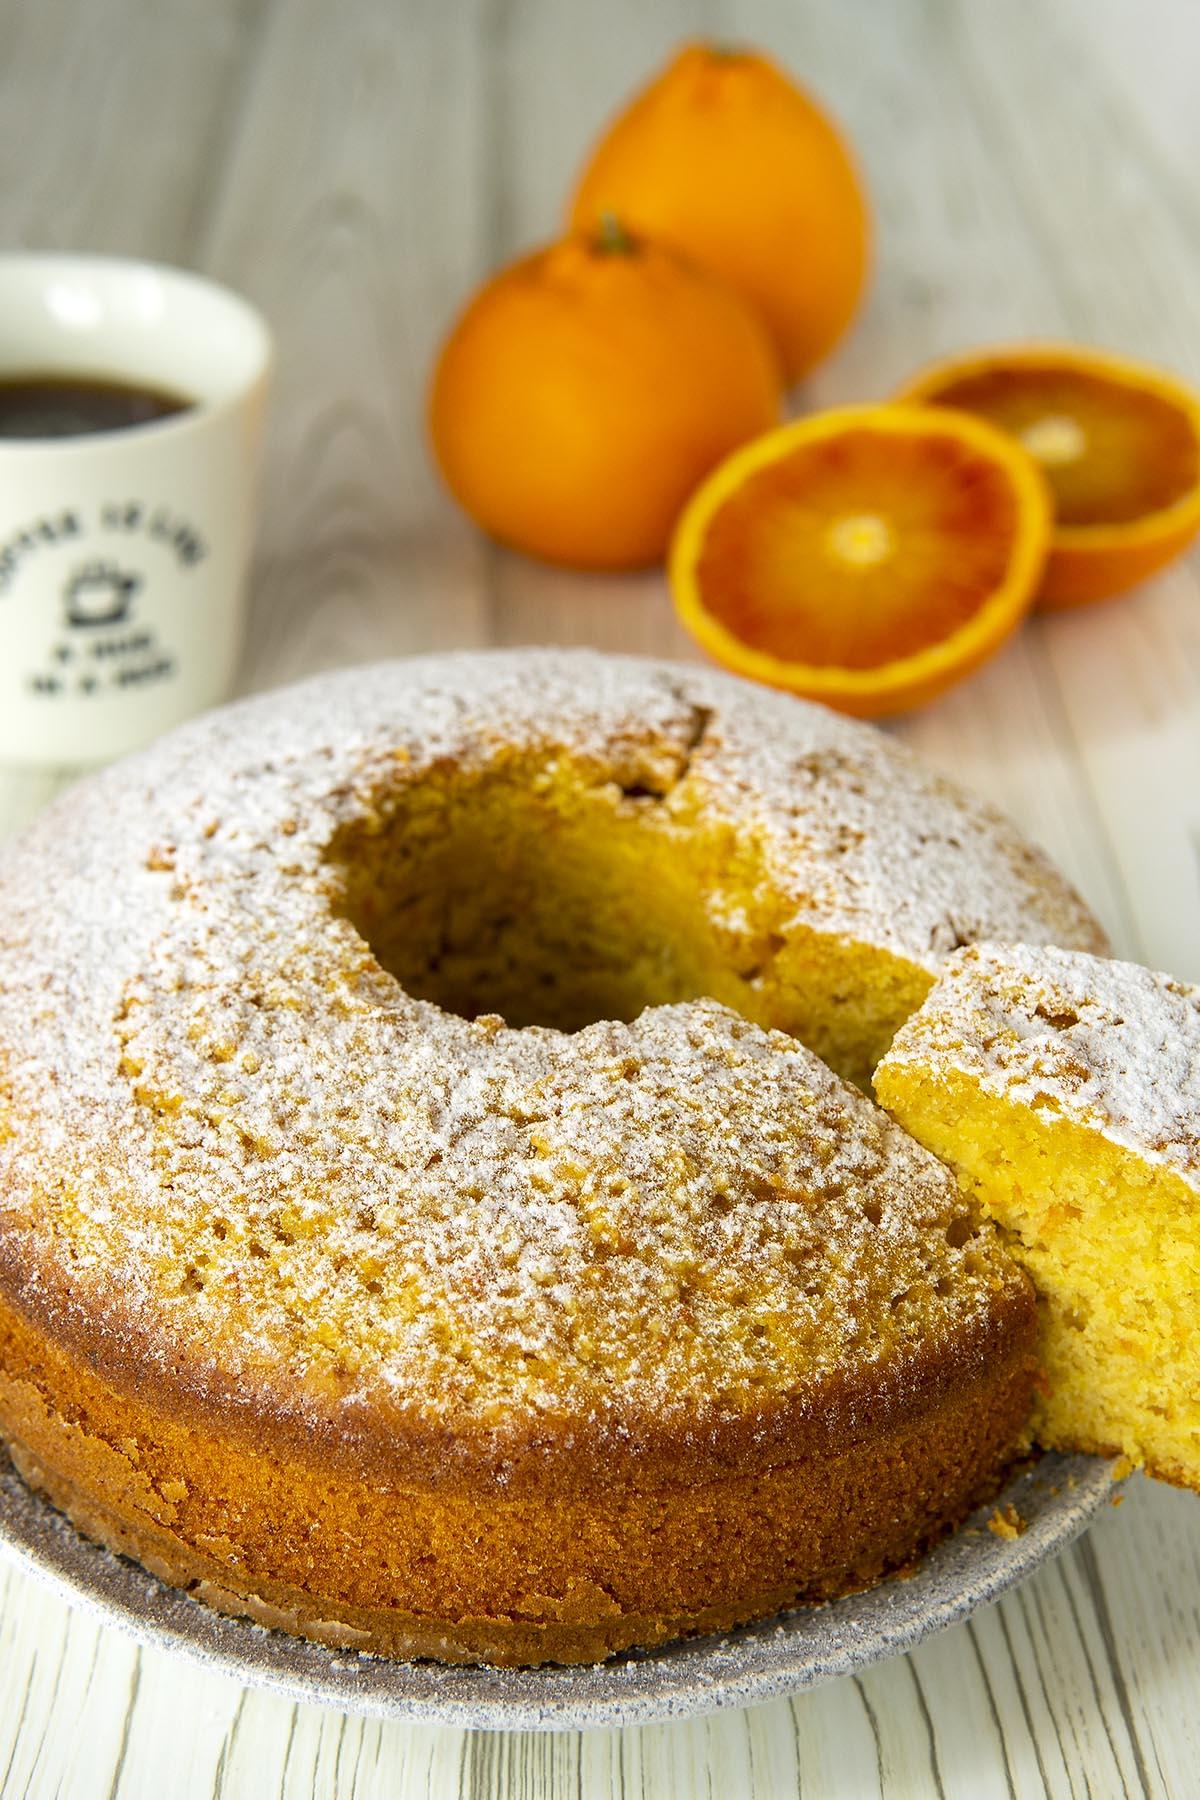 Pan d'arancio siciliano, la ricetta originale per farlo in casa